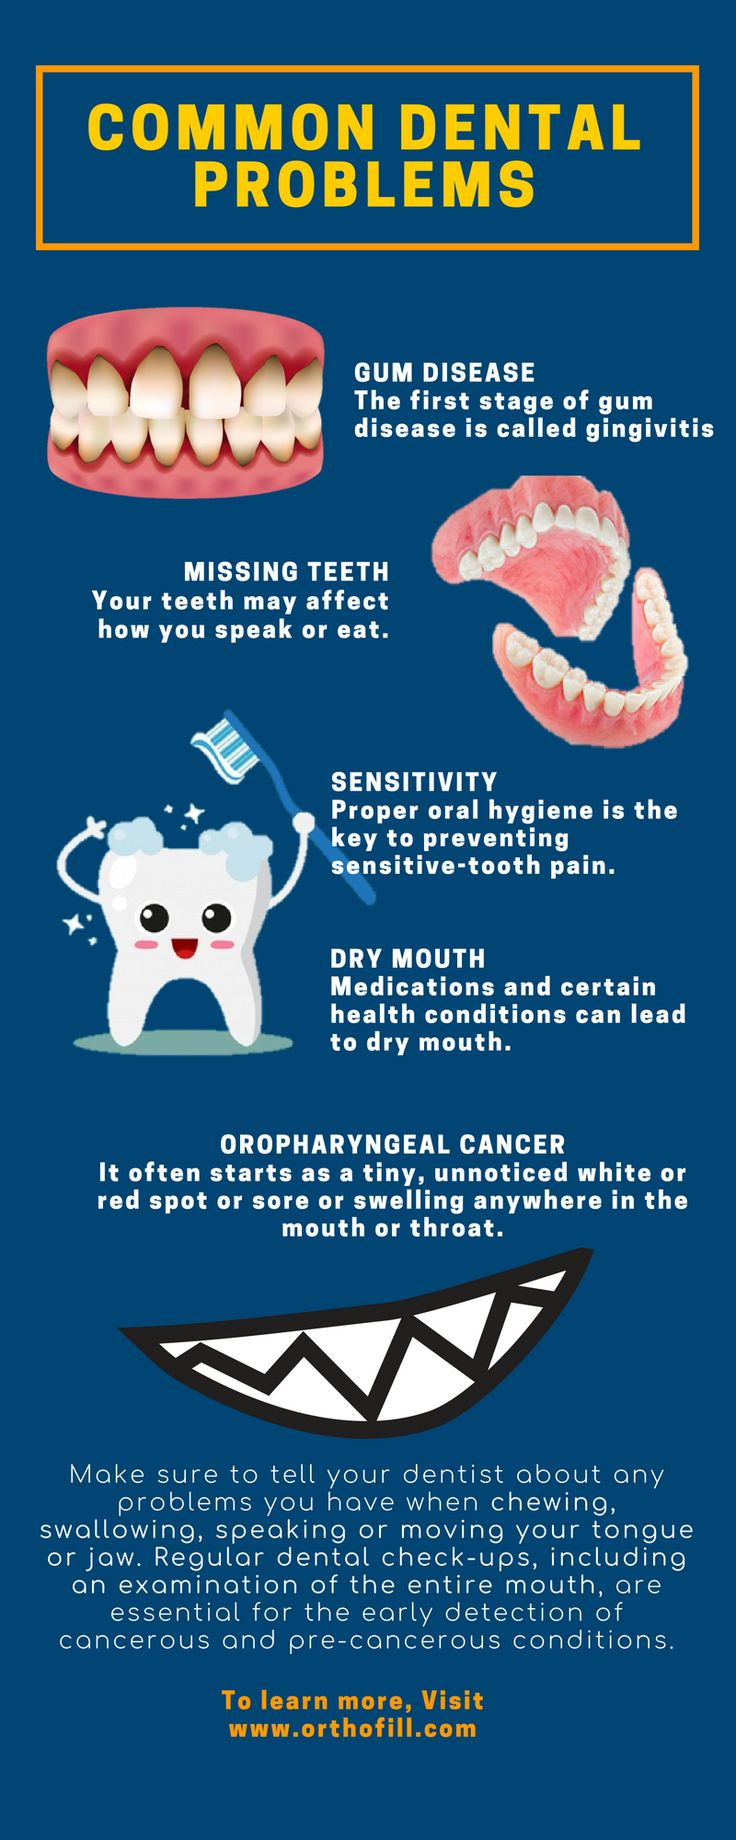 Common Dental Problems. Dental Infographics to make you